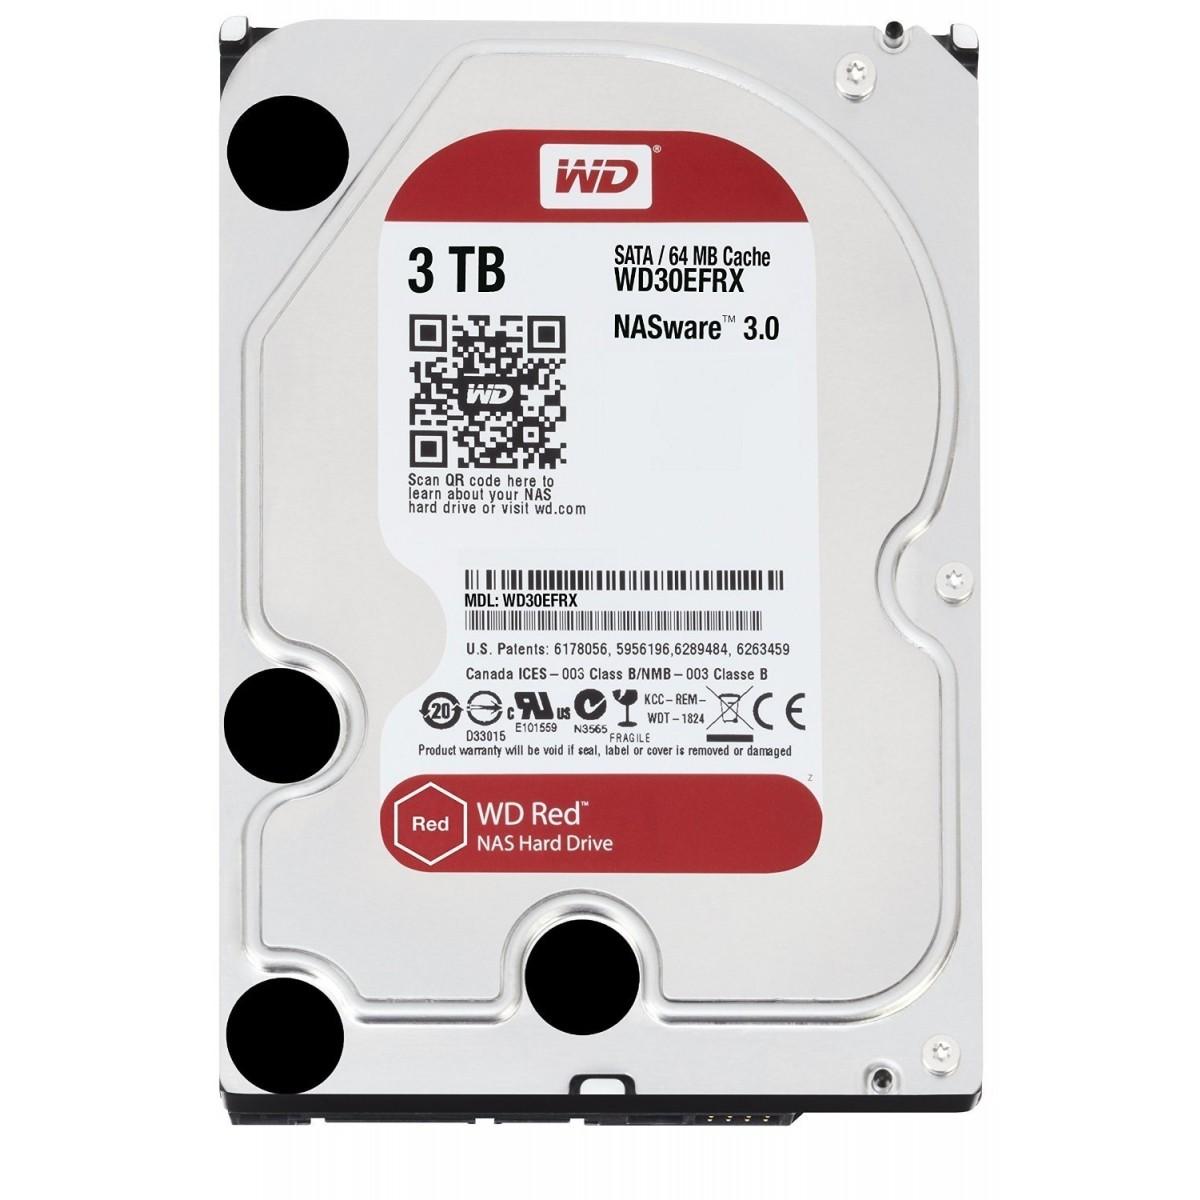 Hard Disk 3TB (Nas) Red Sata III 64MB WD30EFRX - Western Digital